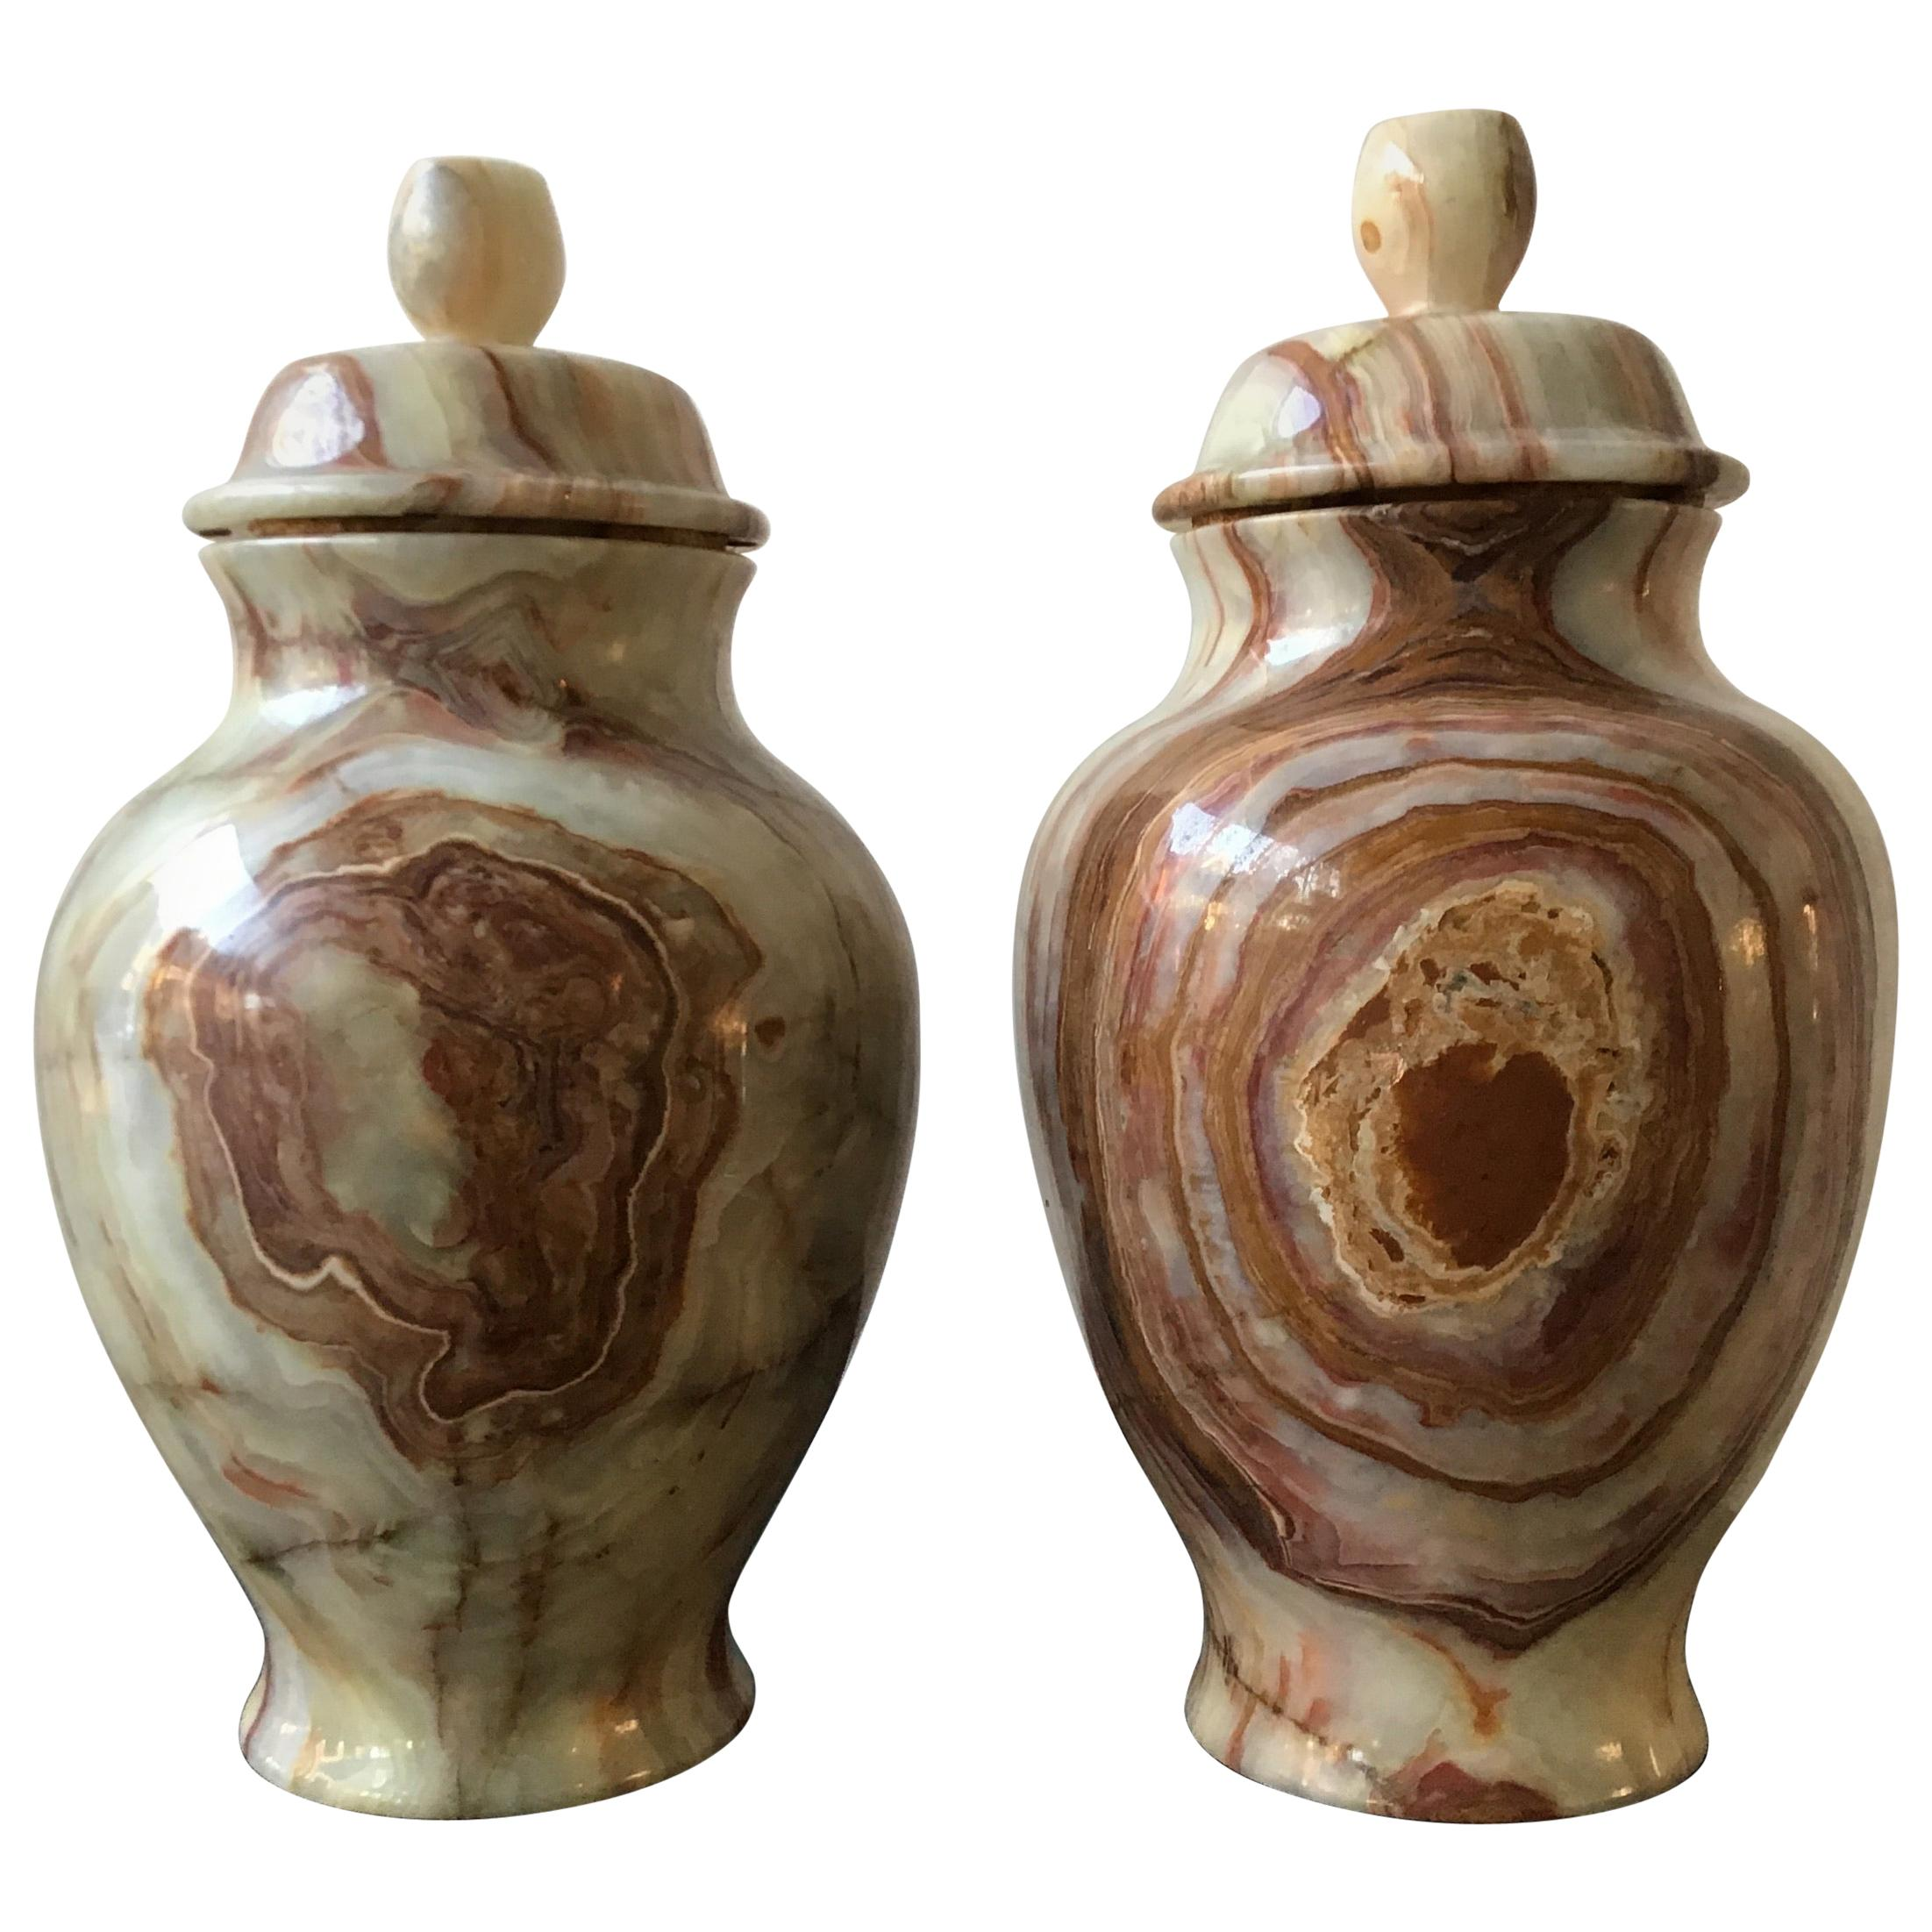 Pair of Onyx Urns